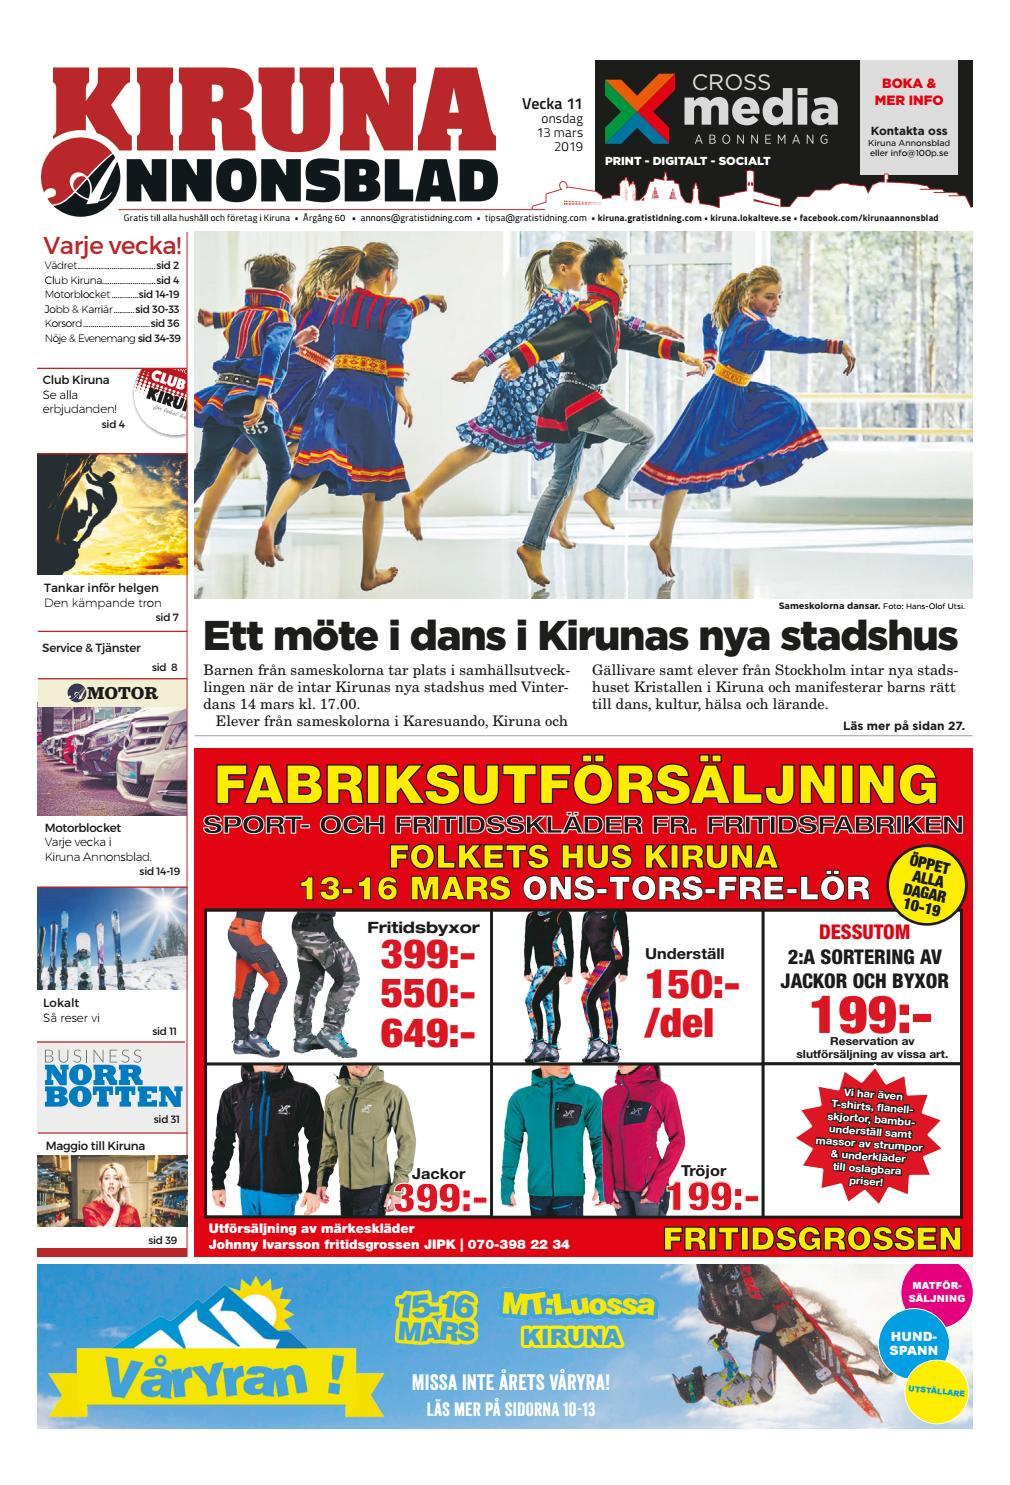 3b59ce5973ed Kiruna Annonsblad vecka 11, 2019 by Svenska Civildatalogerna AB - issuu